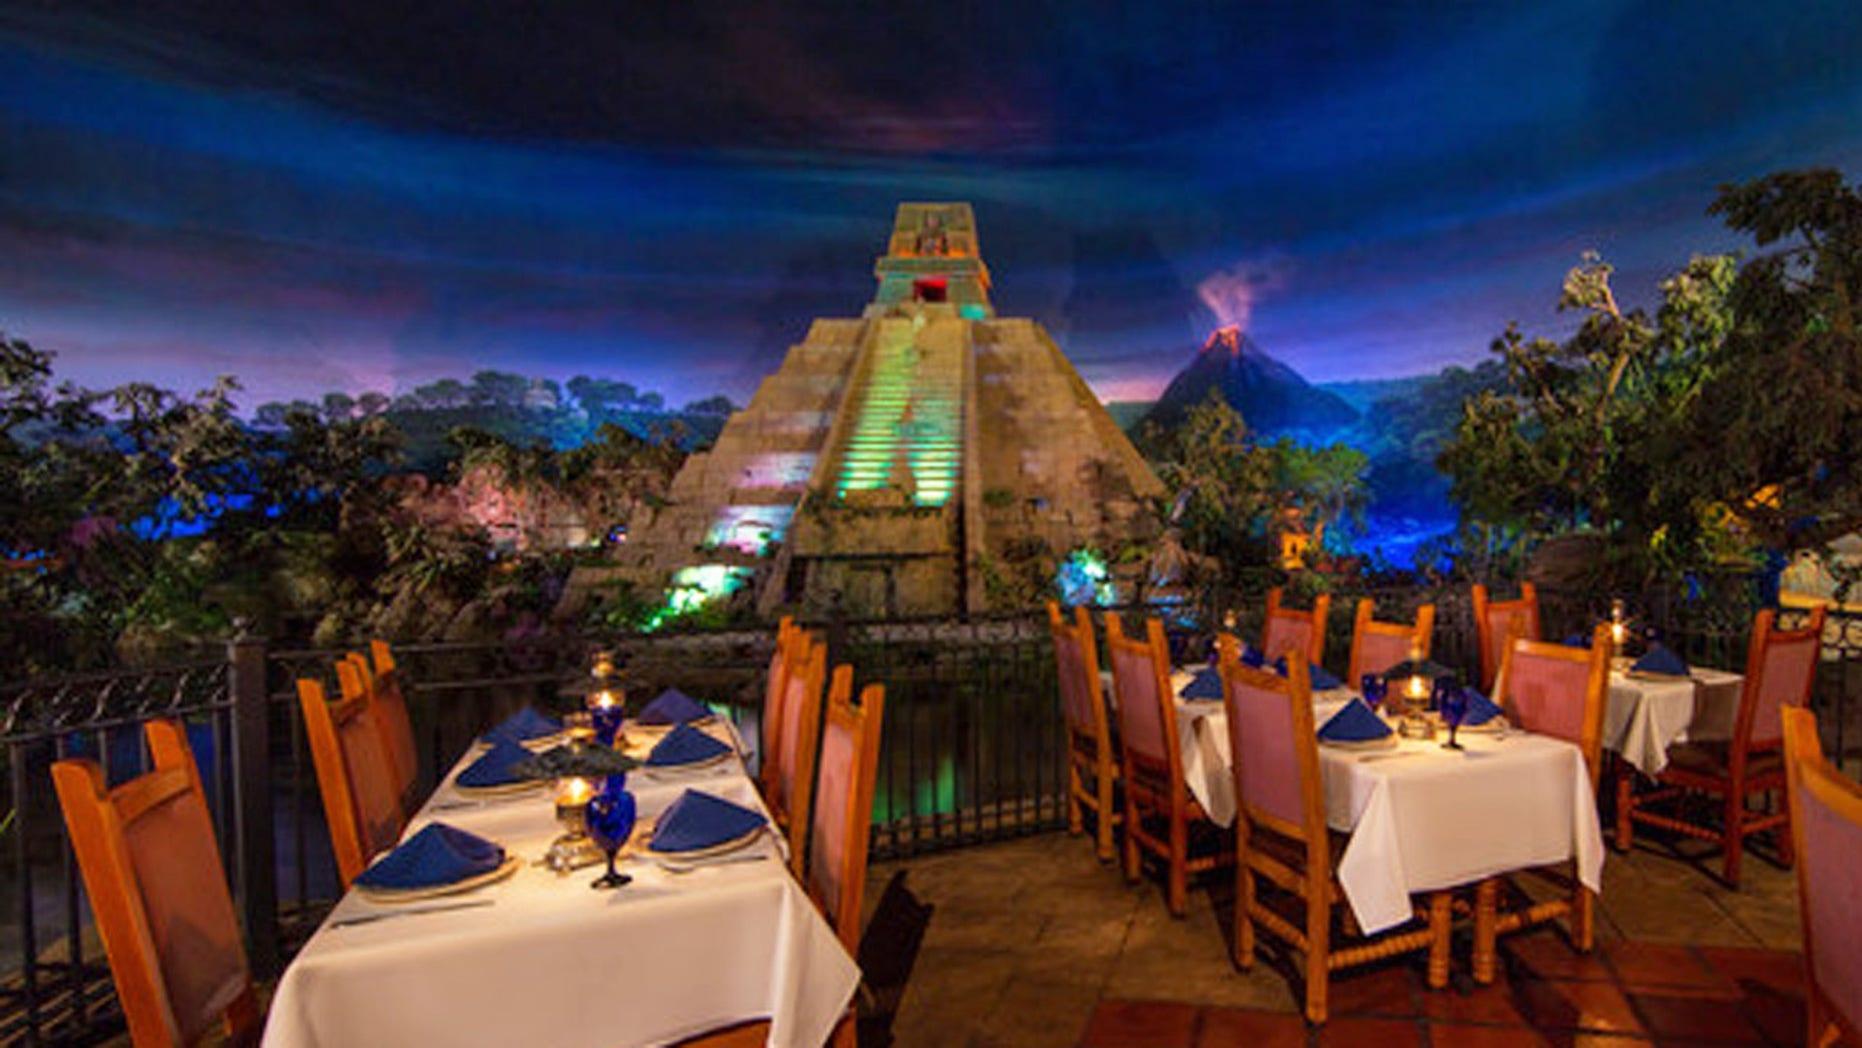 A tourist climbed the Mesoamerican pyramid at Epcot's Mexico Pavilion in Orlando.